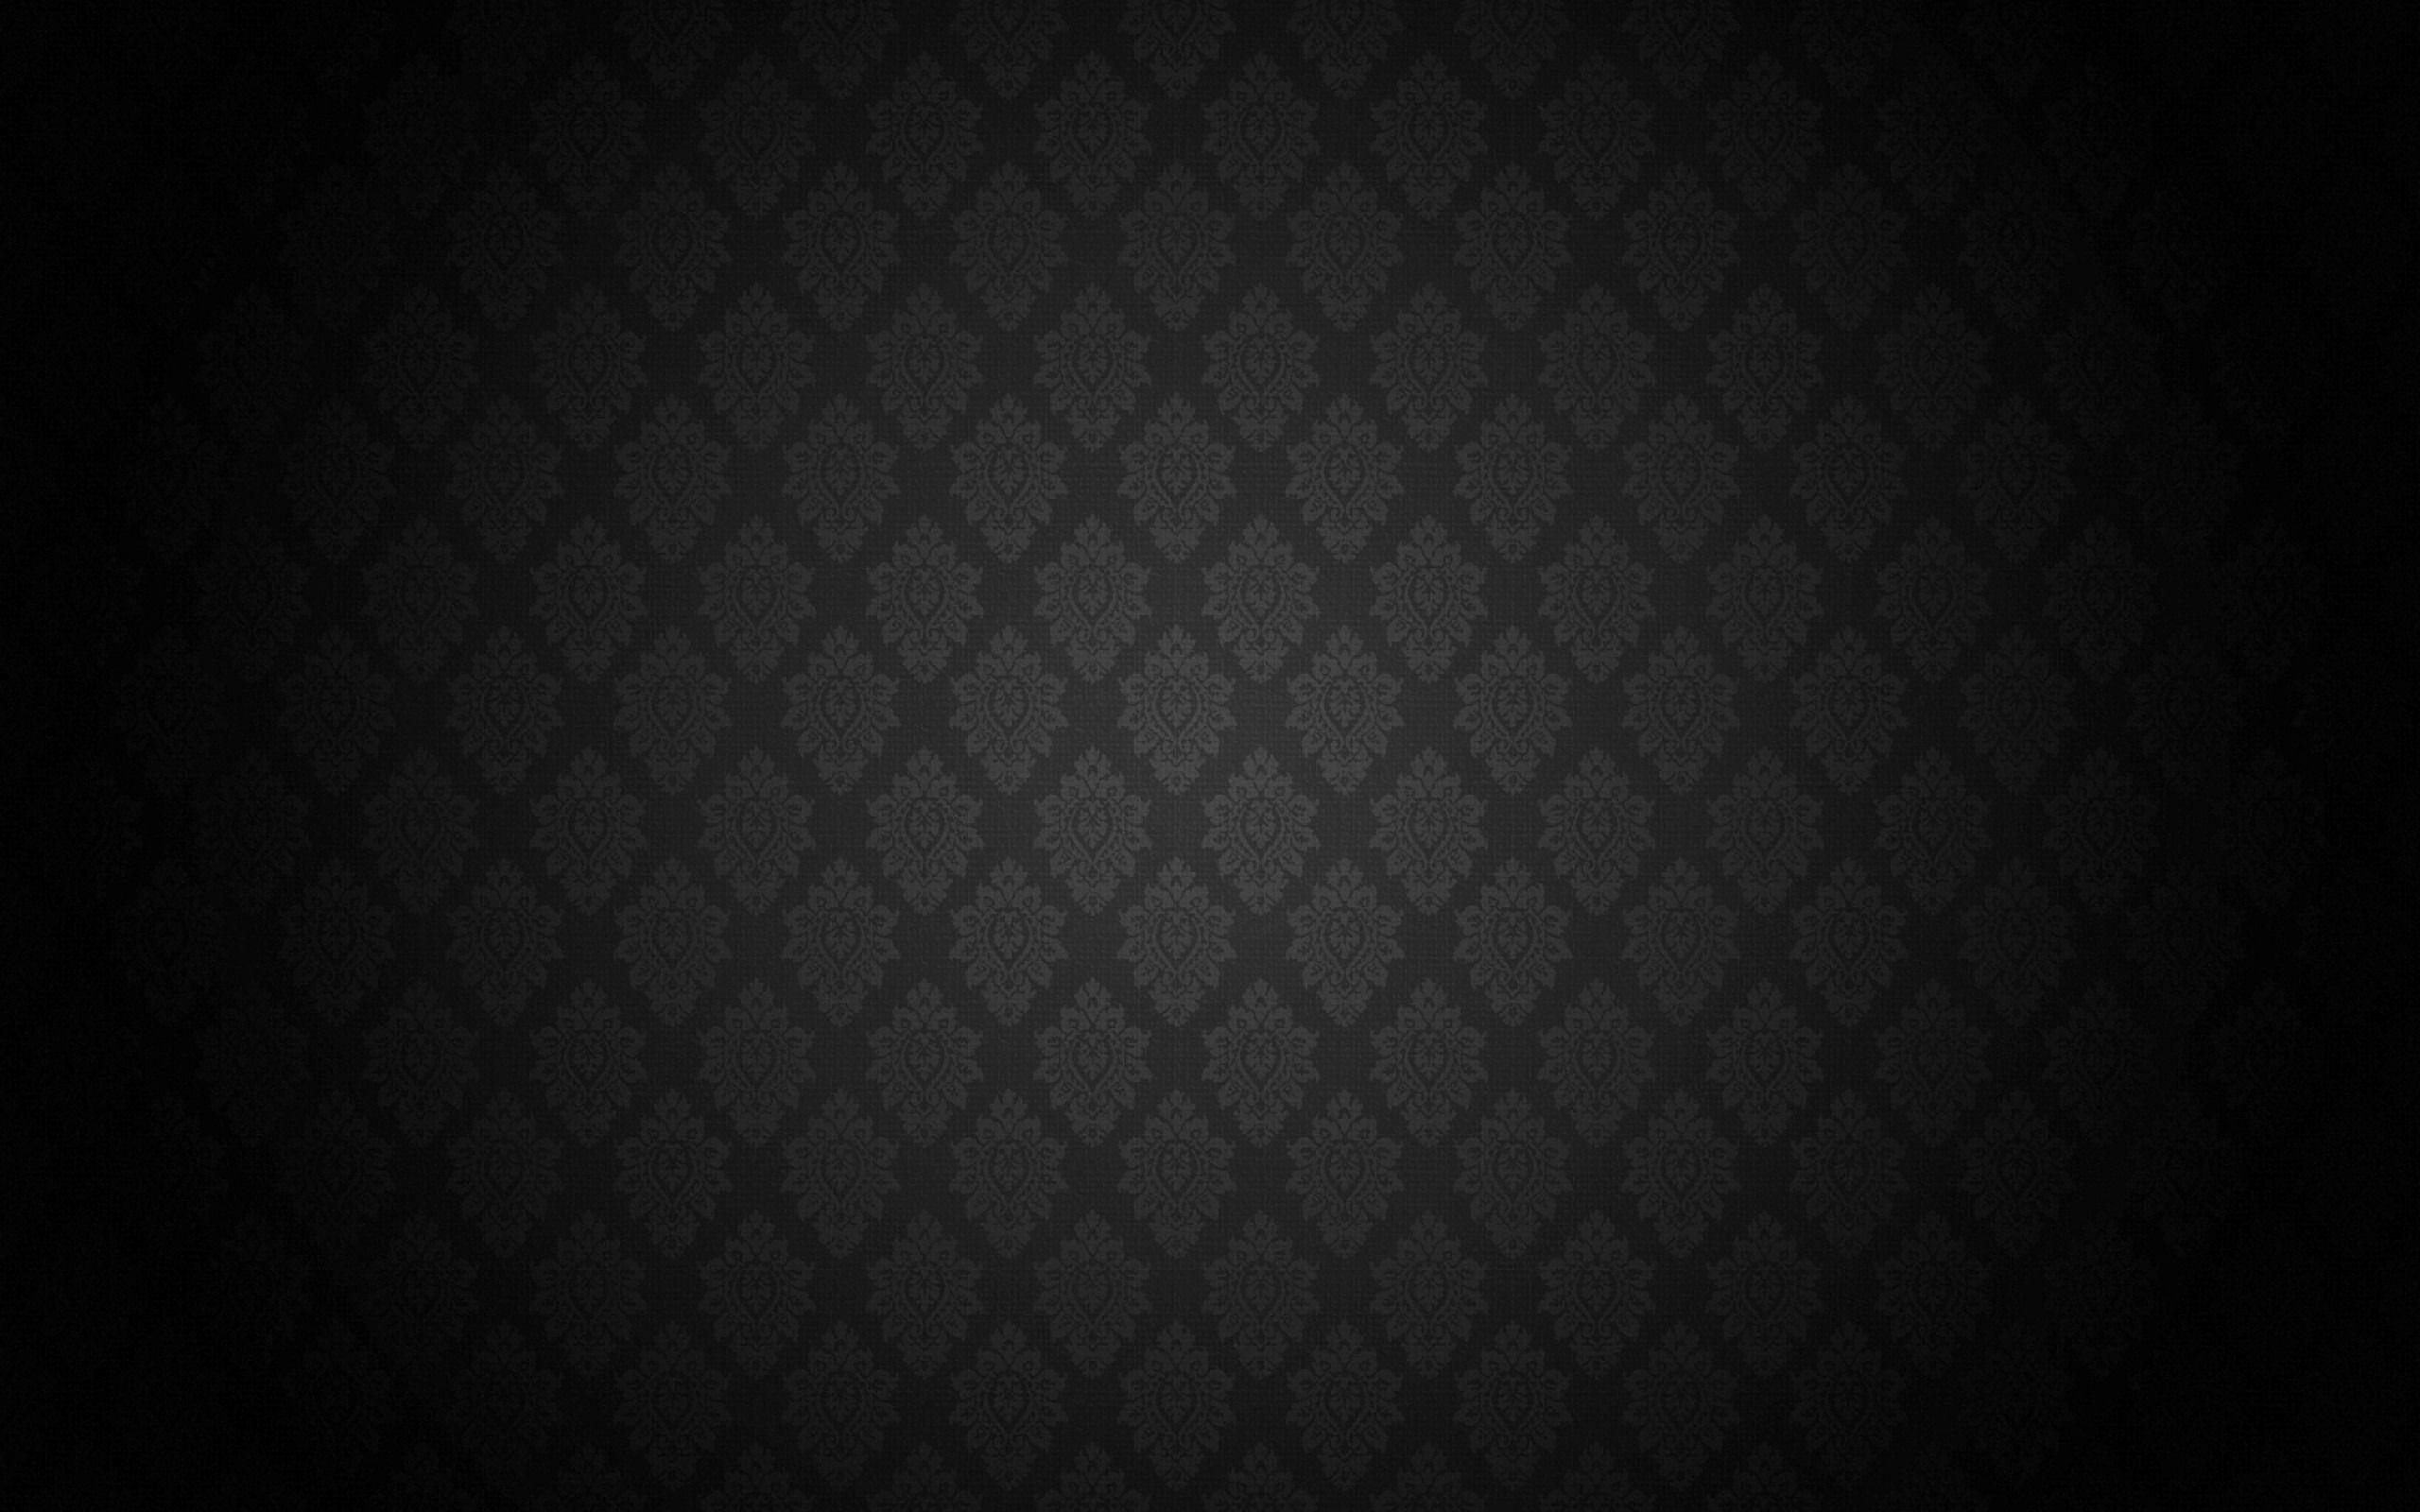 black background design 2018 wallpapers hd black